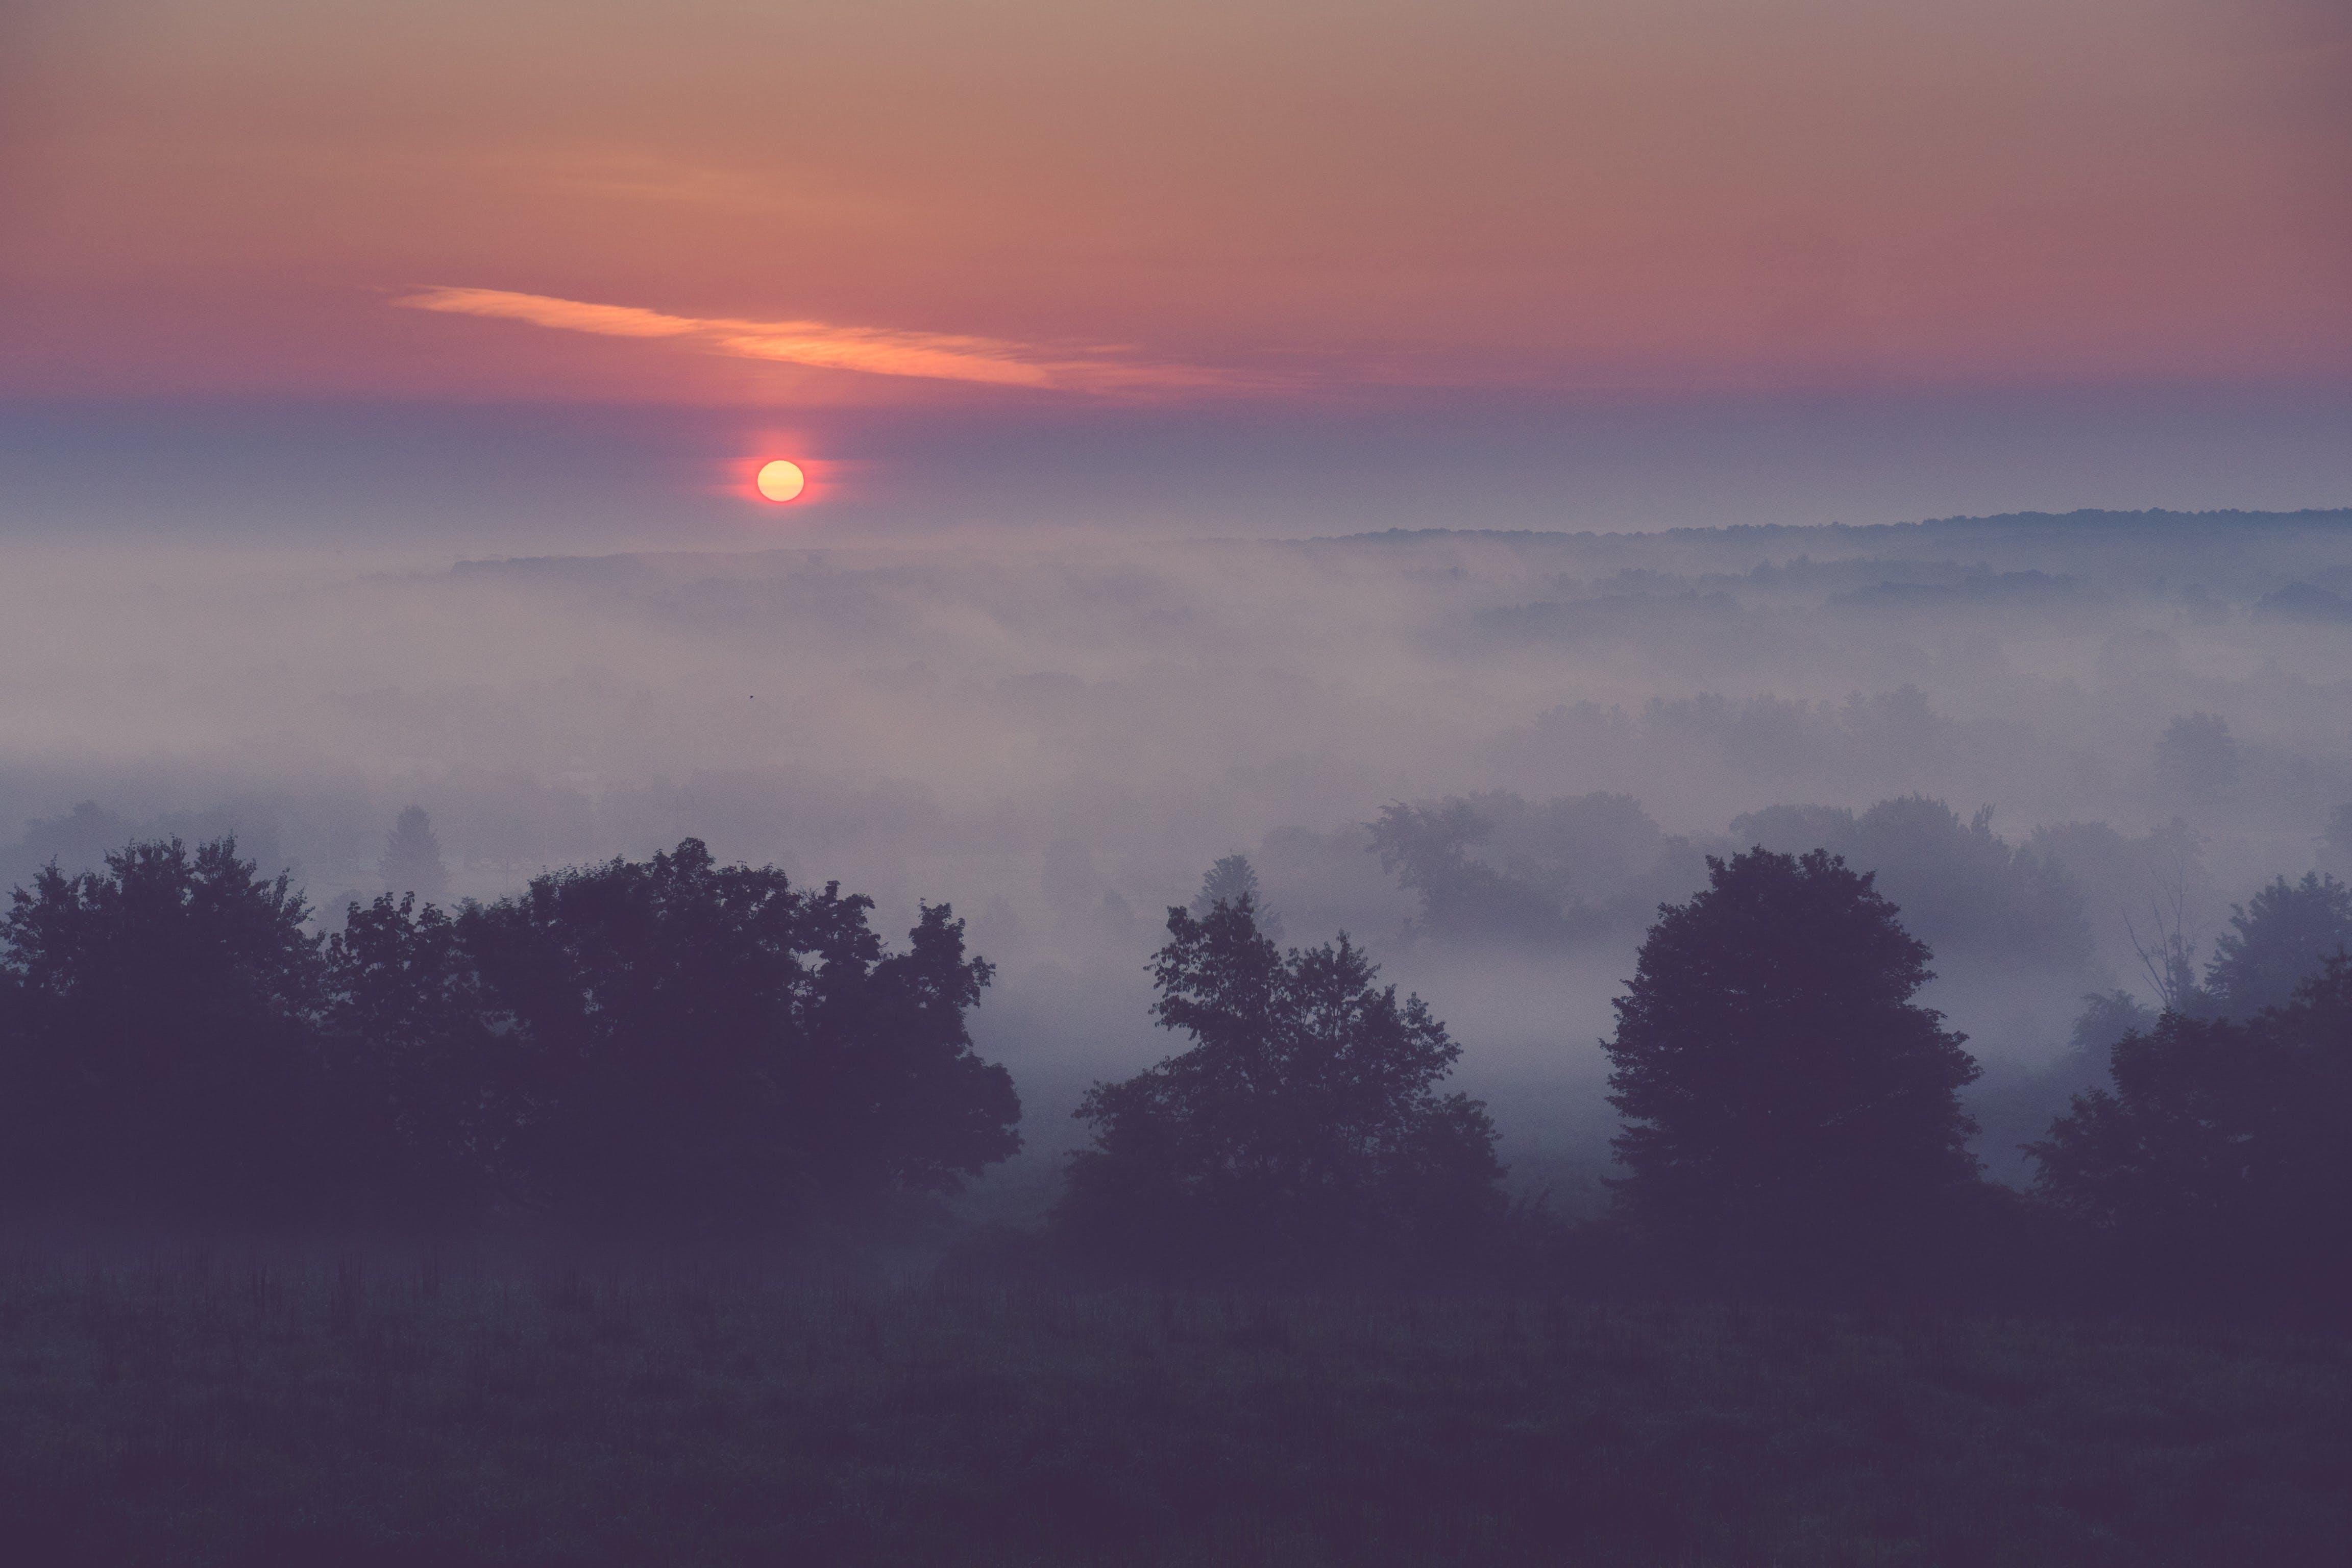 Kostenloses Stock Foto zu landschaft, sonne, sonnenaufgang, morgen